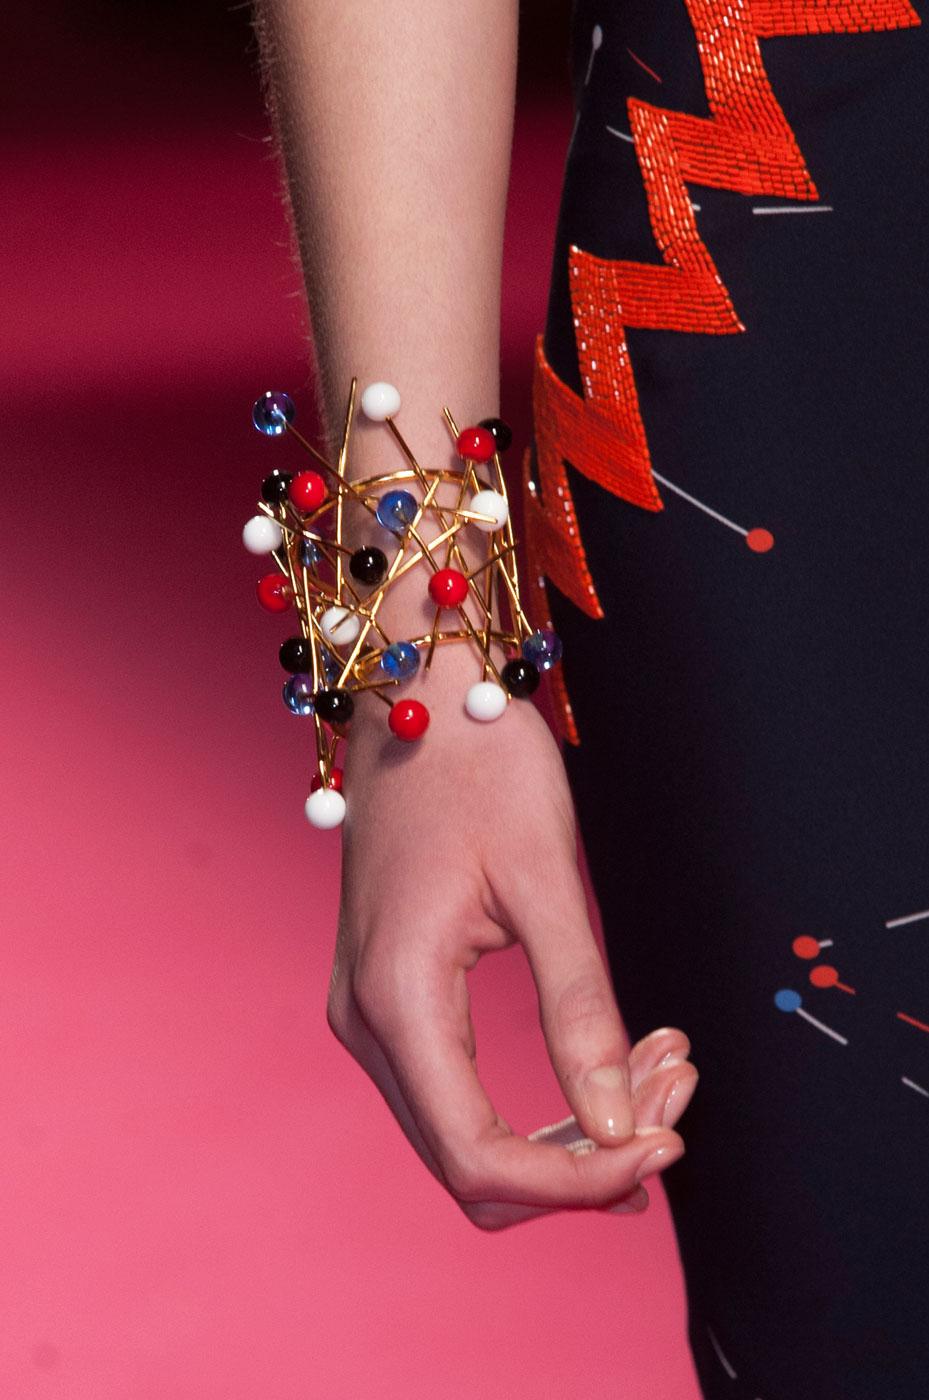 Schiaparelli-fashion-runway-show-close-ups-haute-couture-paris-spring-summer-2015-the-impression-36